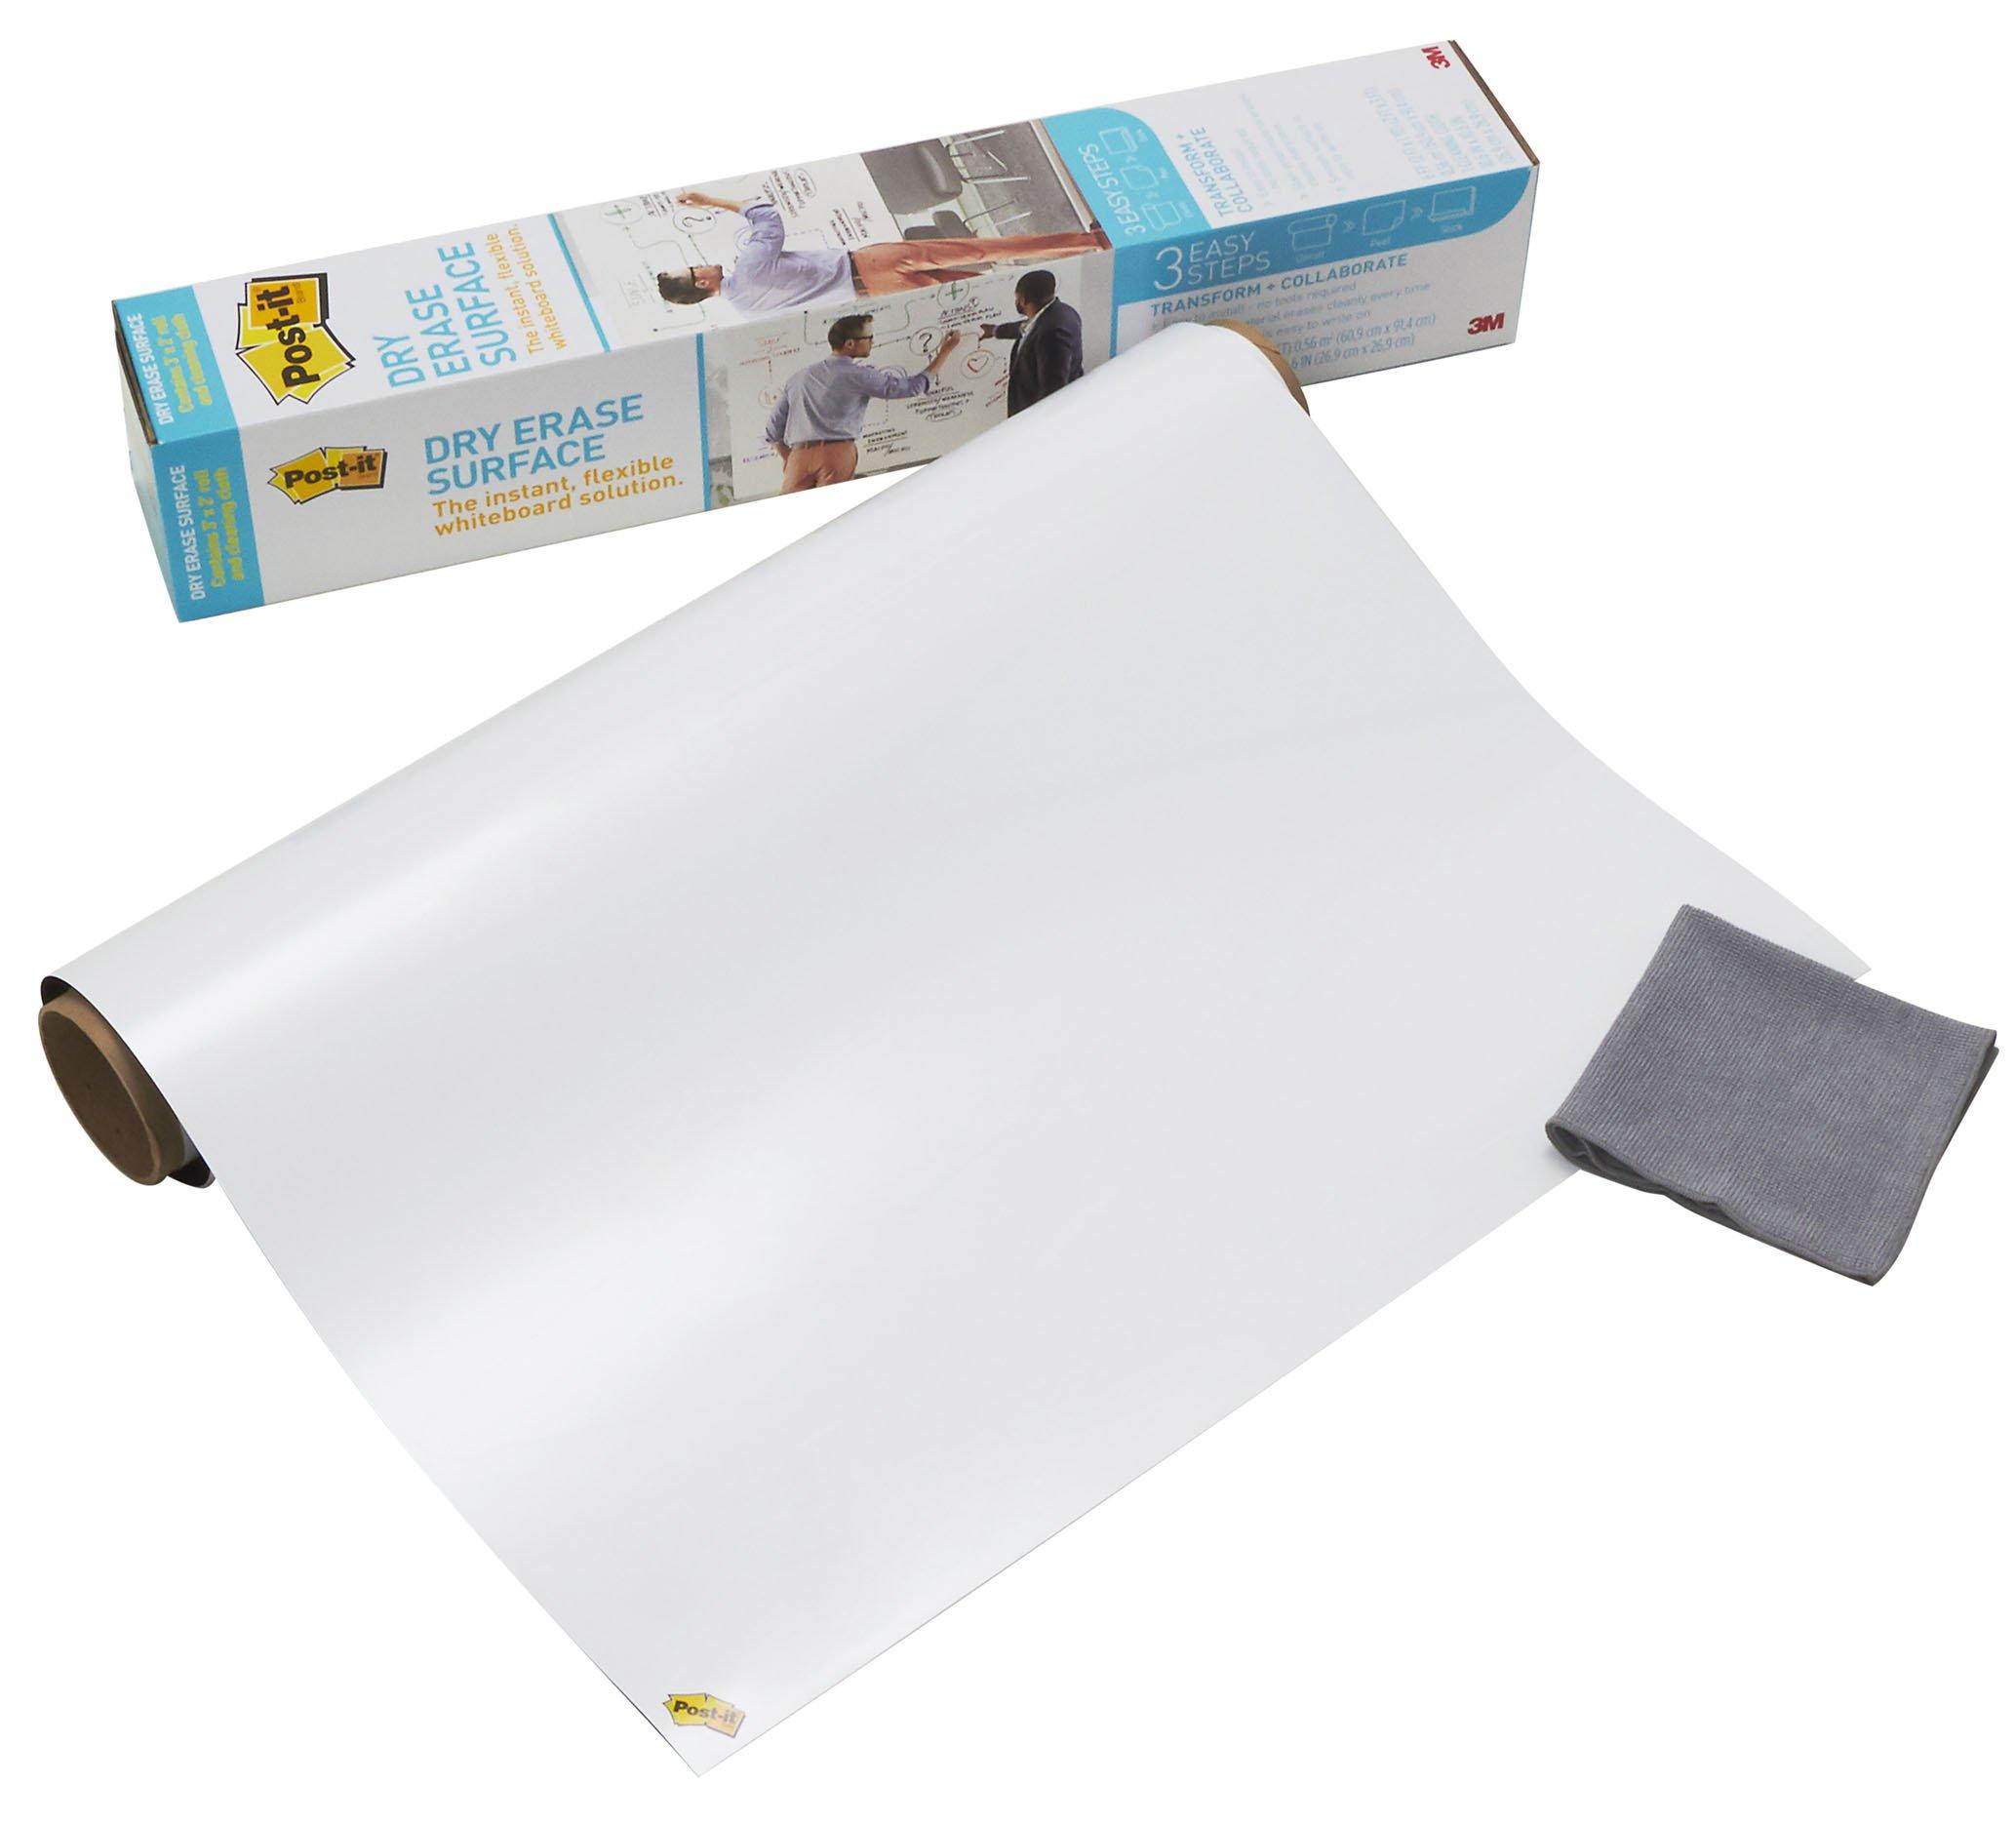 Post-it 121.9 x 182.9 cm Super Sticky Dry Erase Film